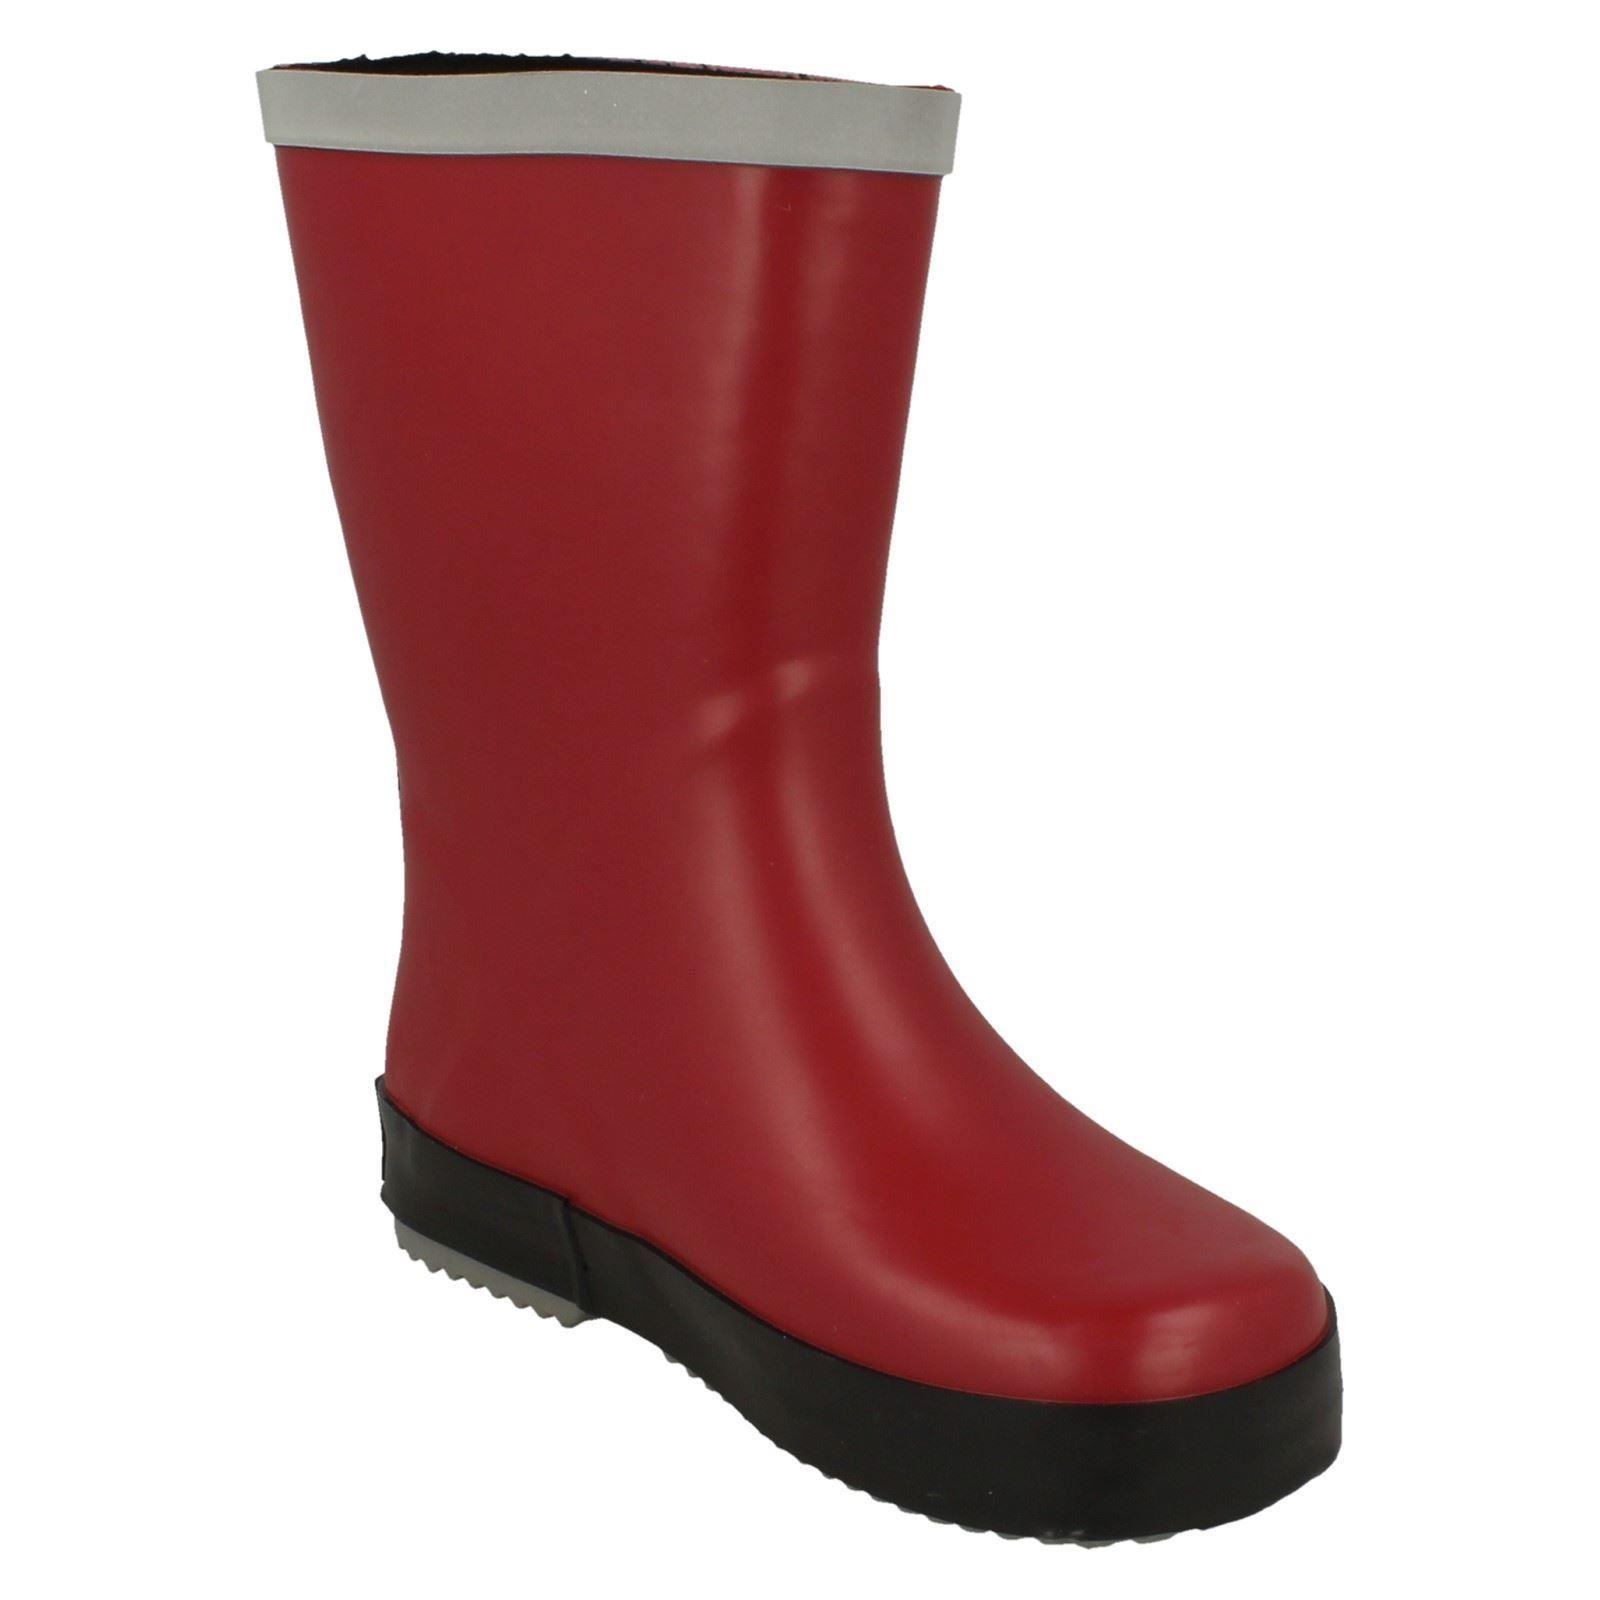 Childrens Clarks Wellington Boots /'Tarri Splash/'